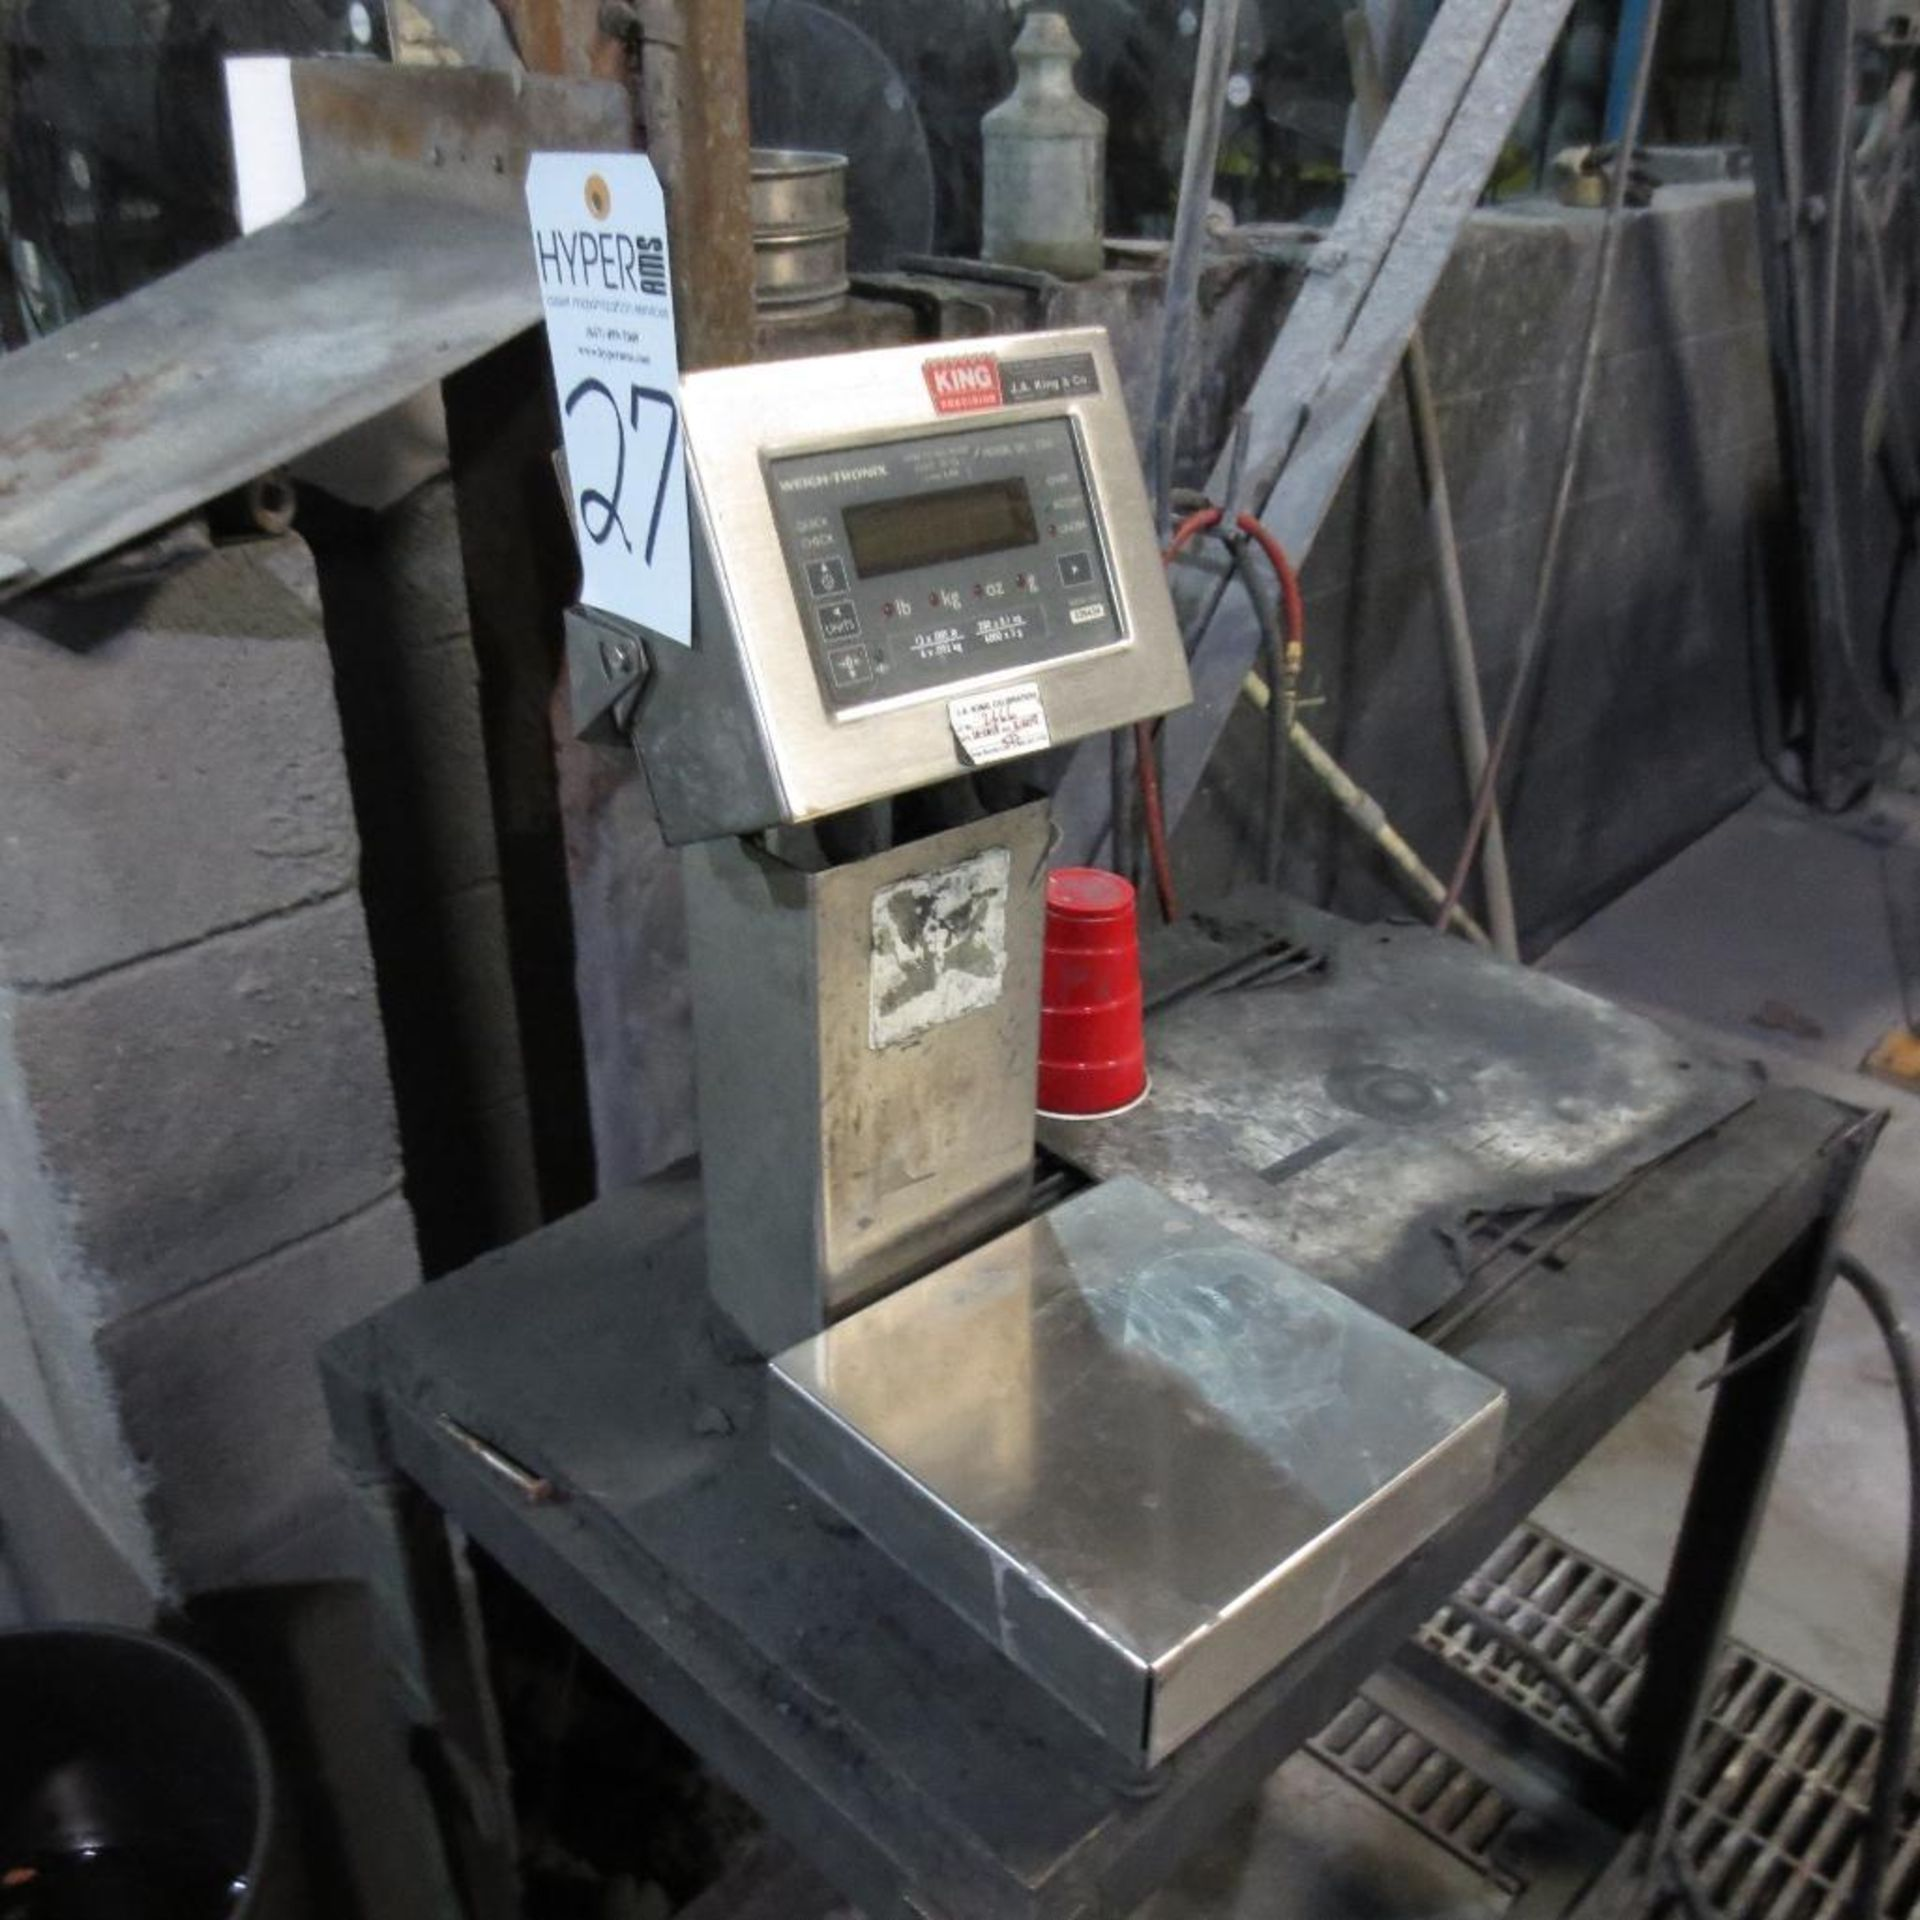 "Lot 27 - Weigh-Tronix Model QC-3265 Scale, S/N 026434, 8 1/2"" X 8 1/2"" Platform"